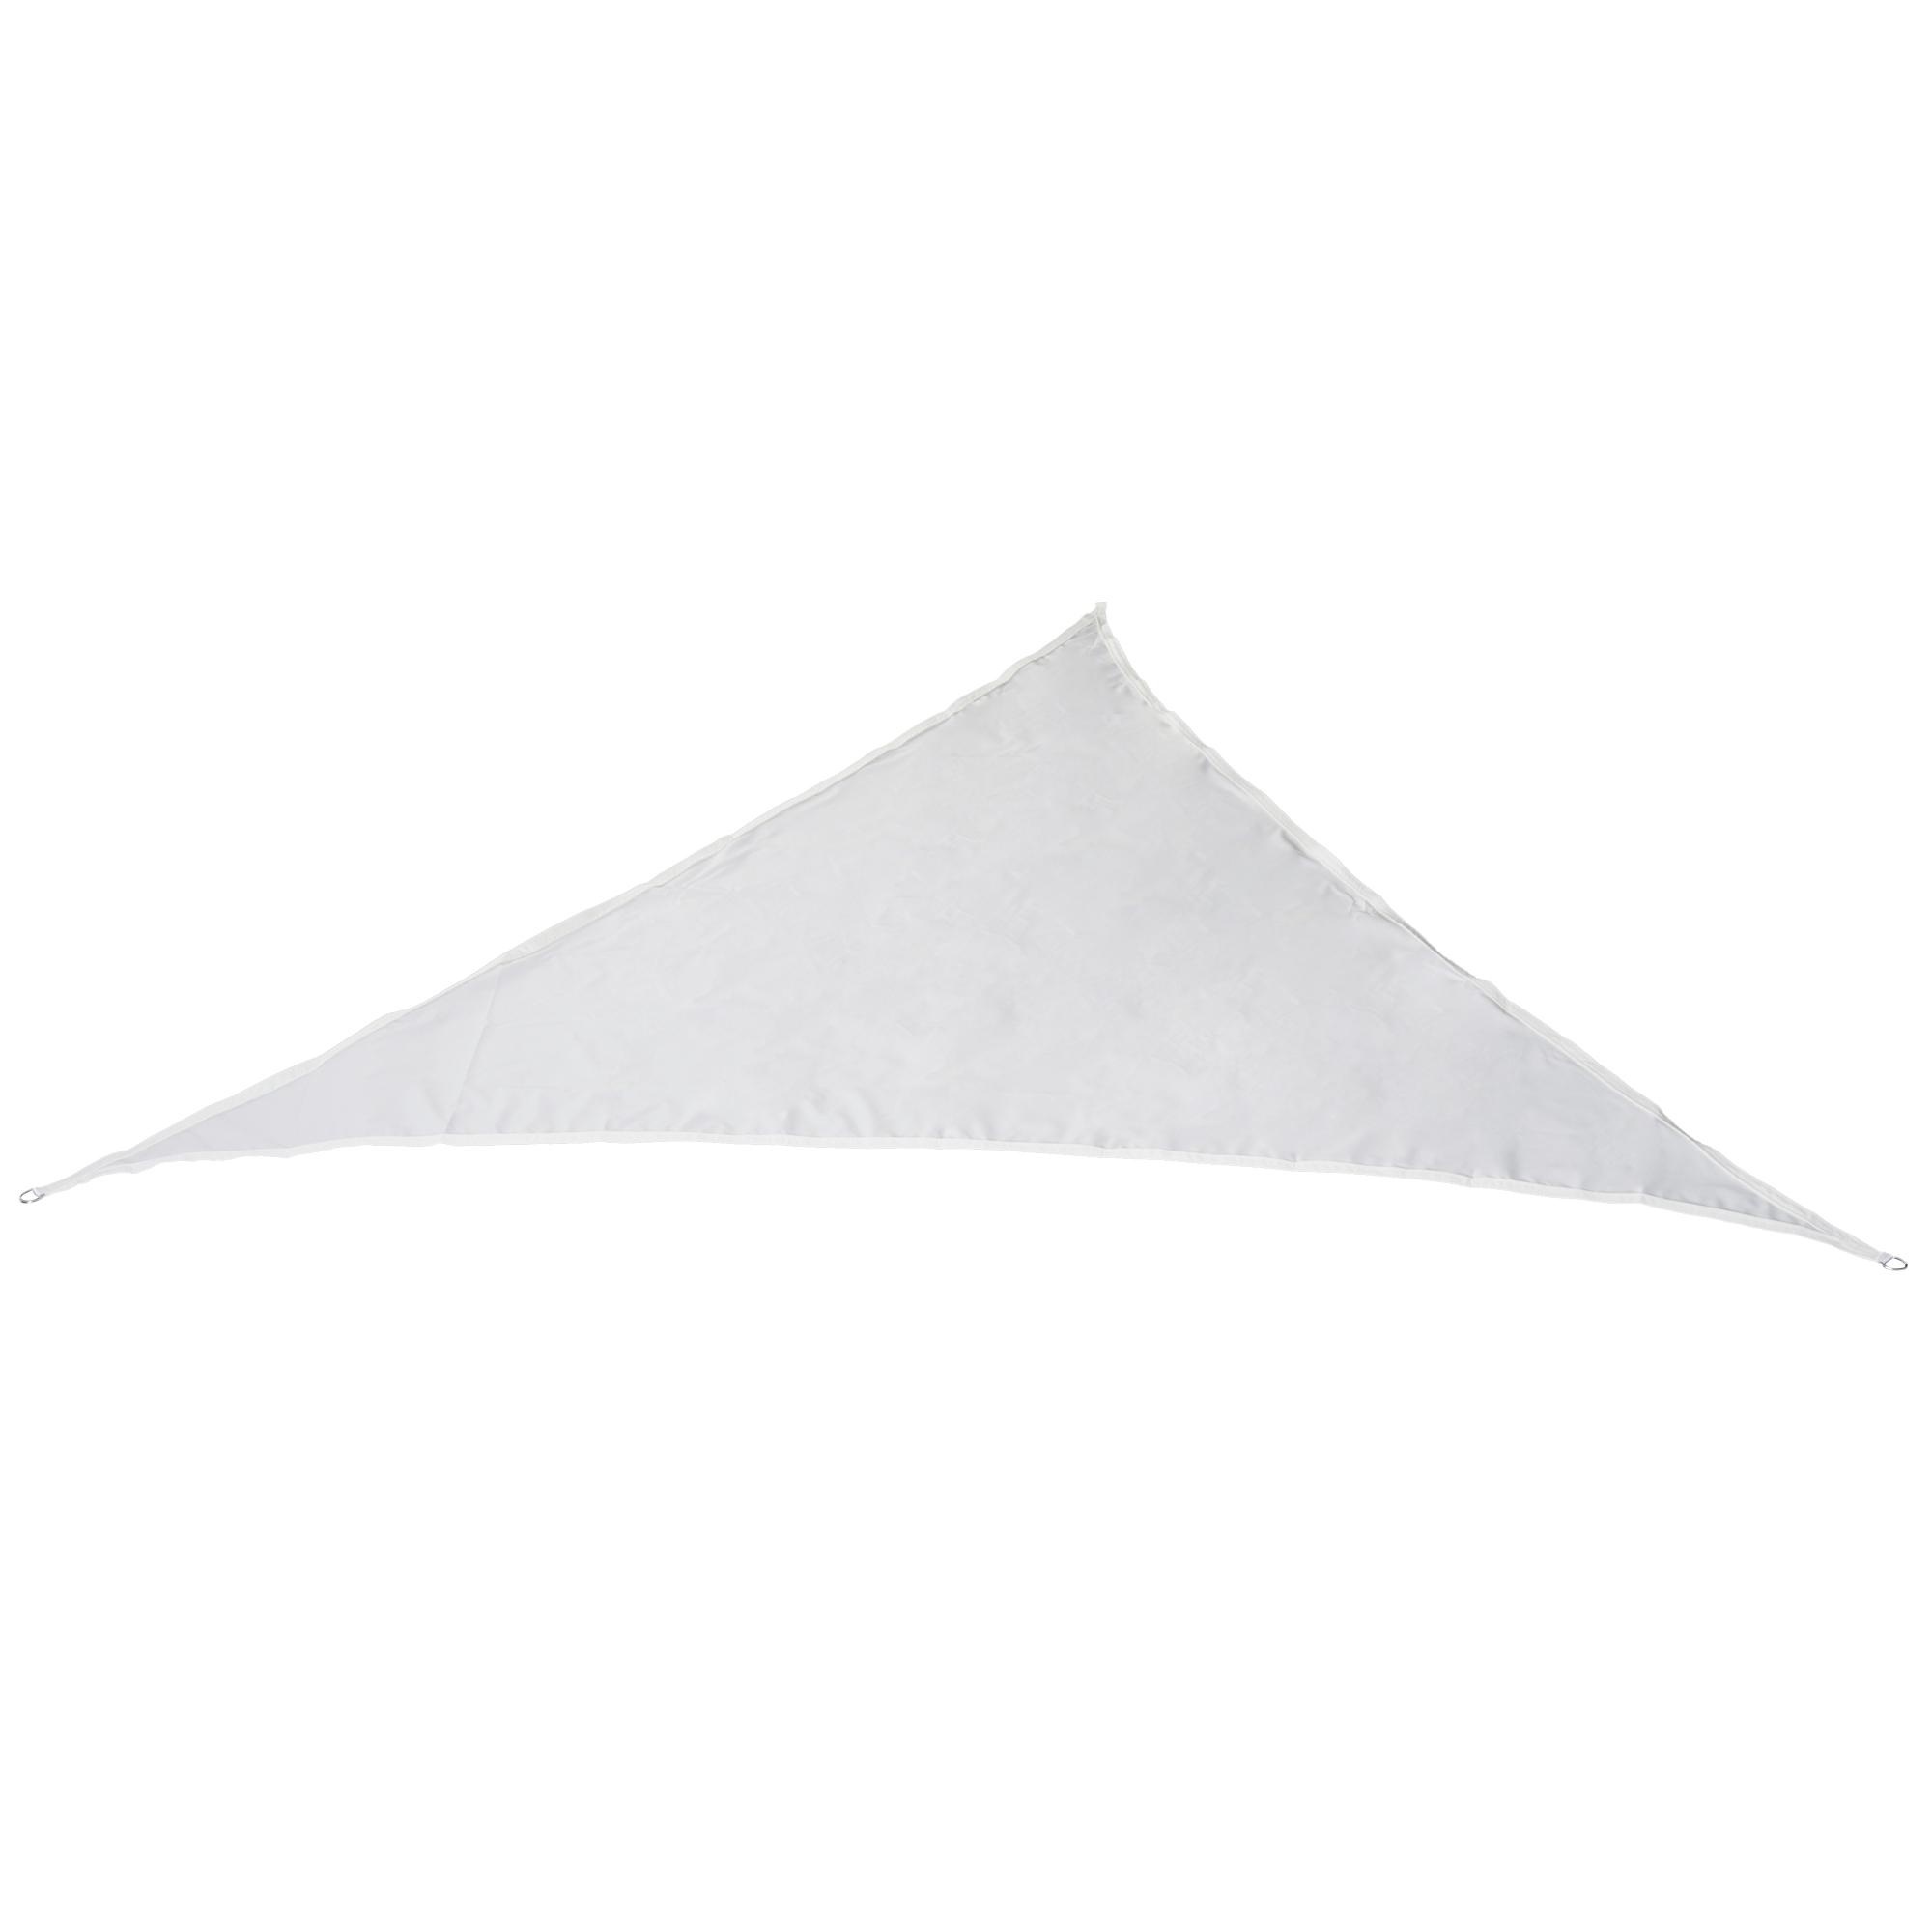 Toldo-Vela-Sombrilla-Parasol-Triangulo-Tejido-de-Poliester-160g-m2-Jardin-Playa miniatura 18